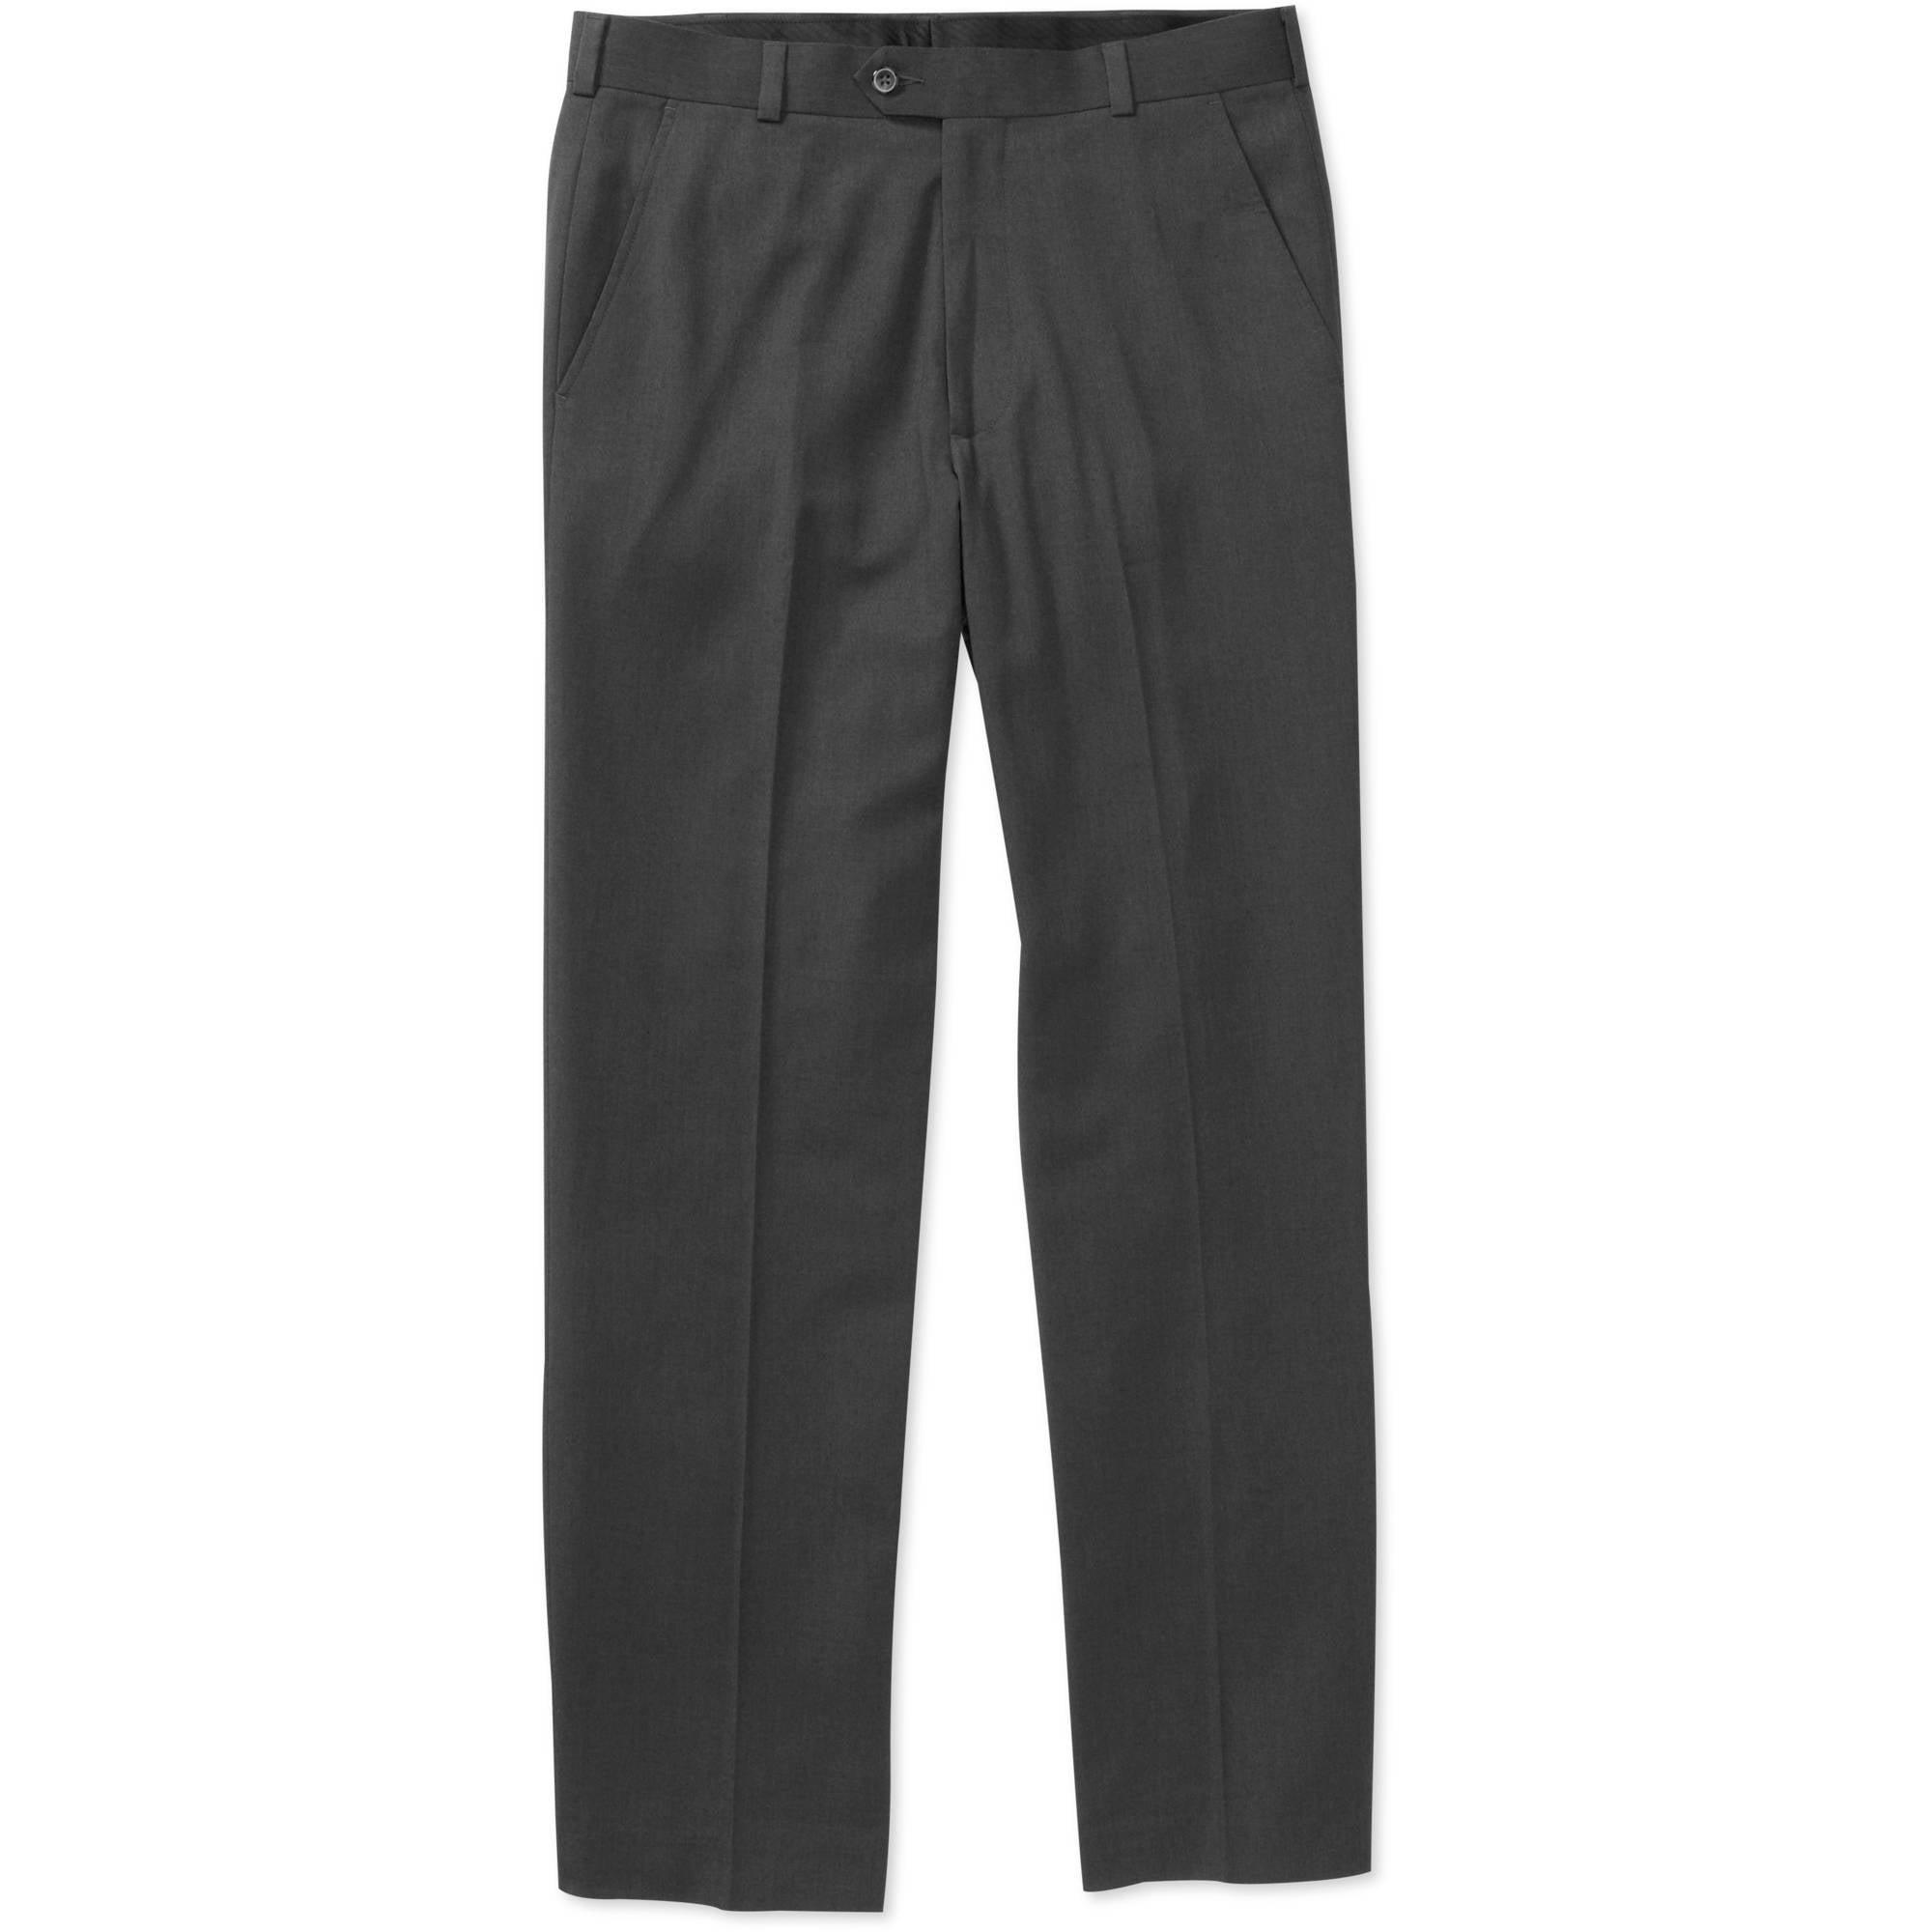 George Dress Pants Mens Size 34 x 34 Flat Front Wrinkle Resistant Polyester Black